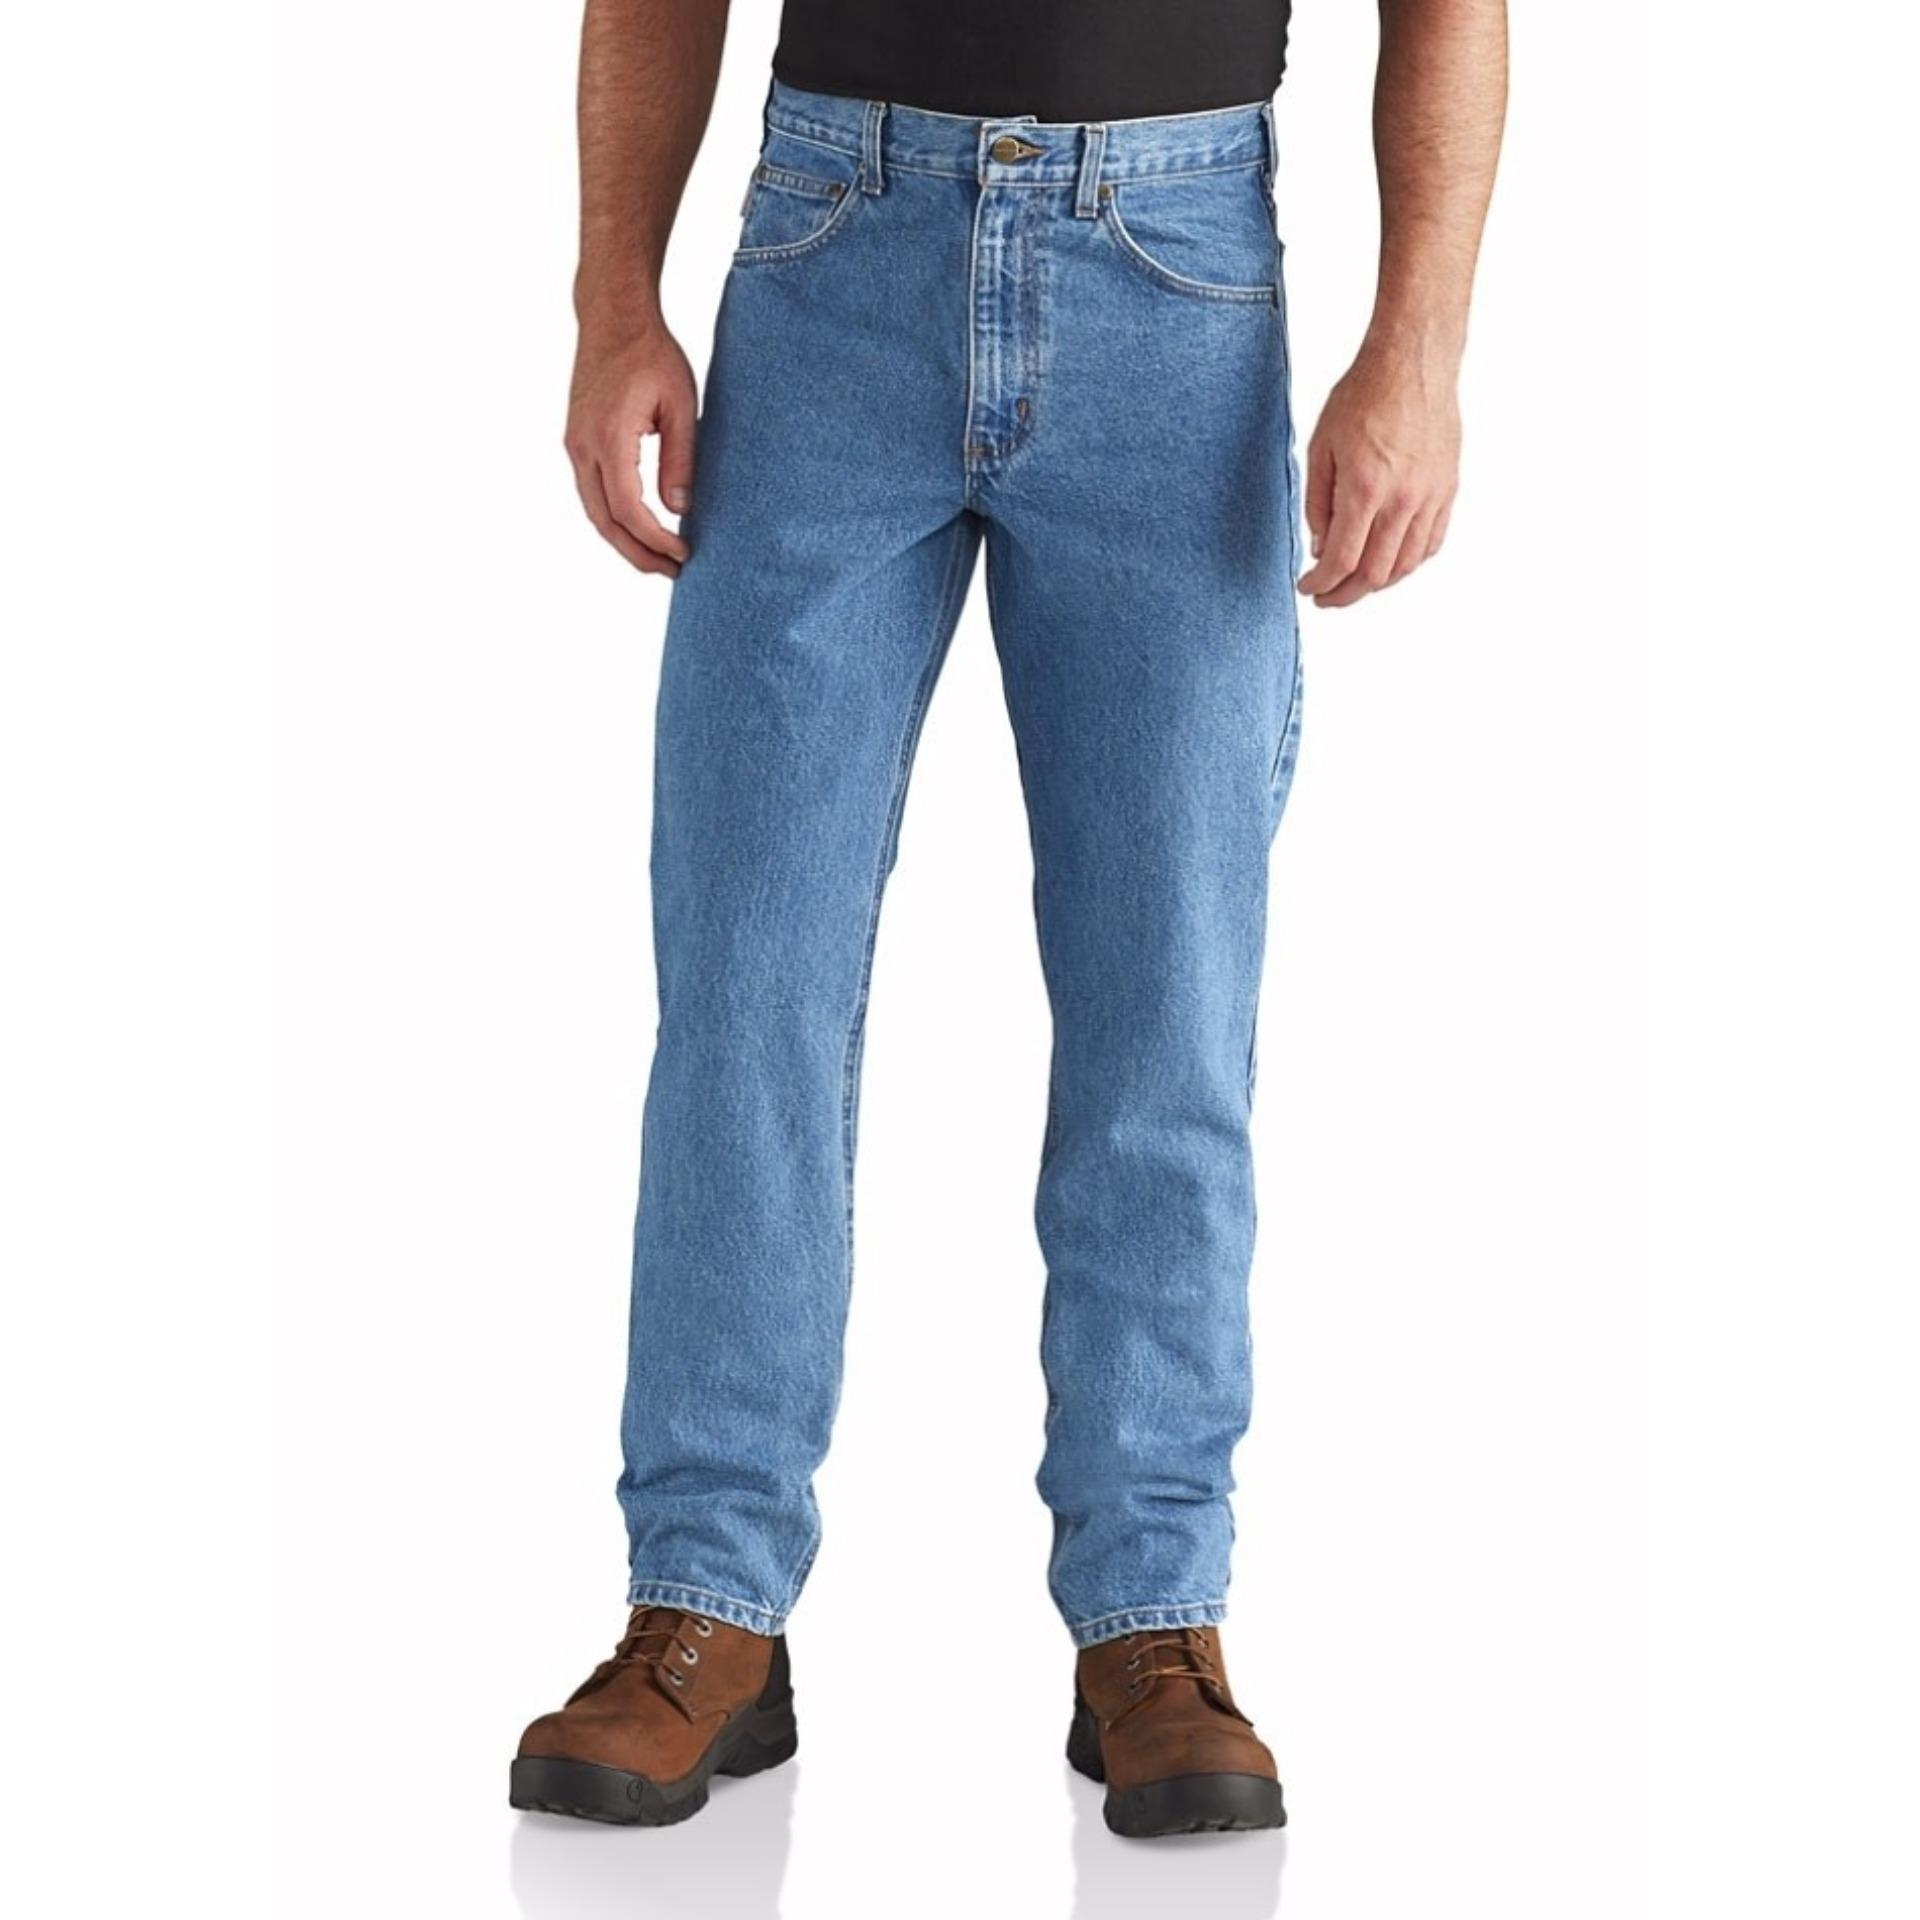 Toko Texan Celana Jeans Standard Pria Warna Biru Muda Light Blue Celana Jeans Big Size 33 34 35 36 37 38 Dekat Sini